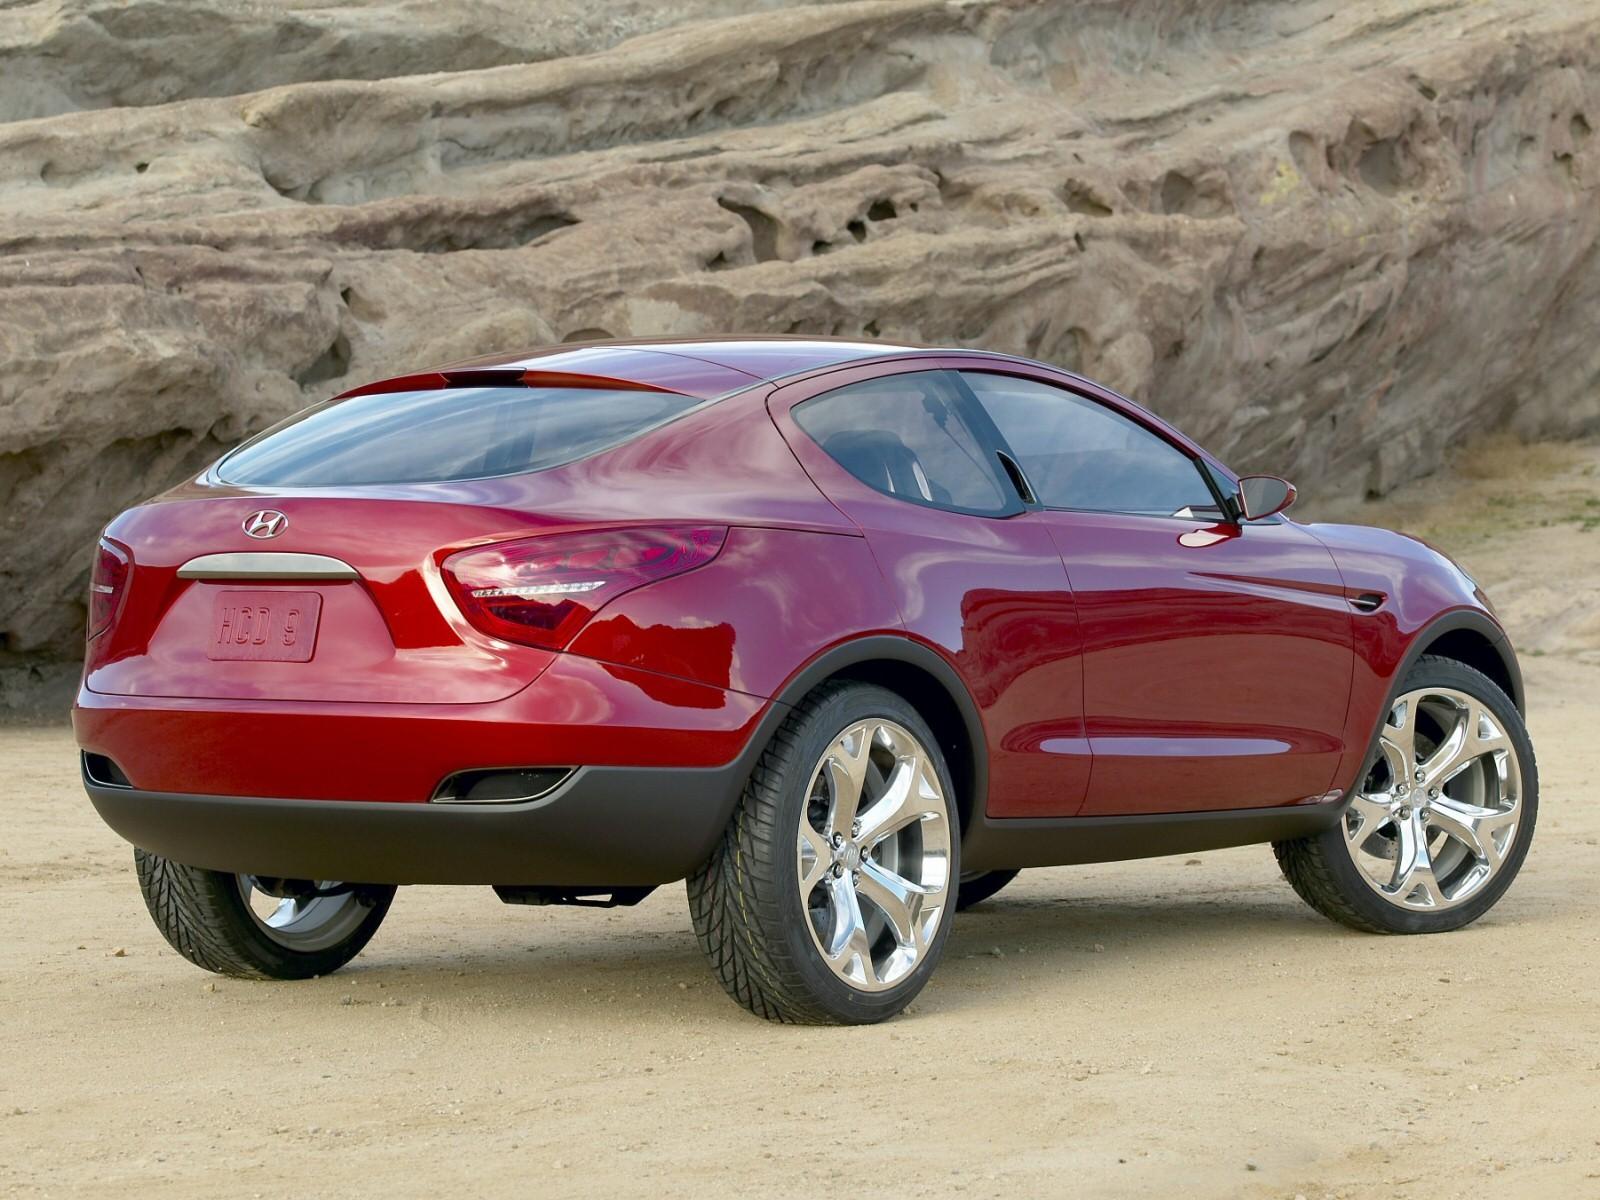 2006 Hyundai HCD9 Talus Concept